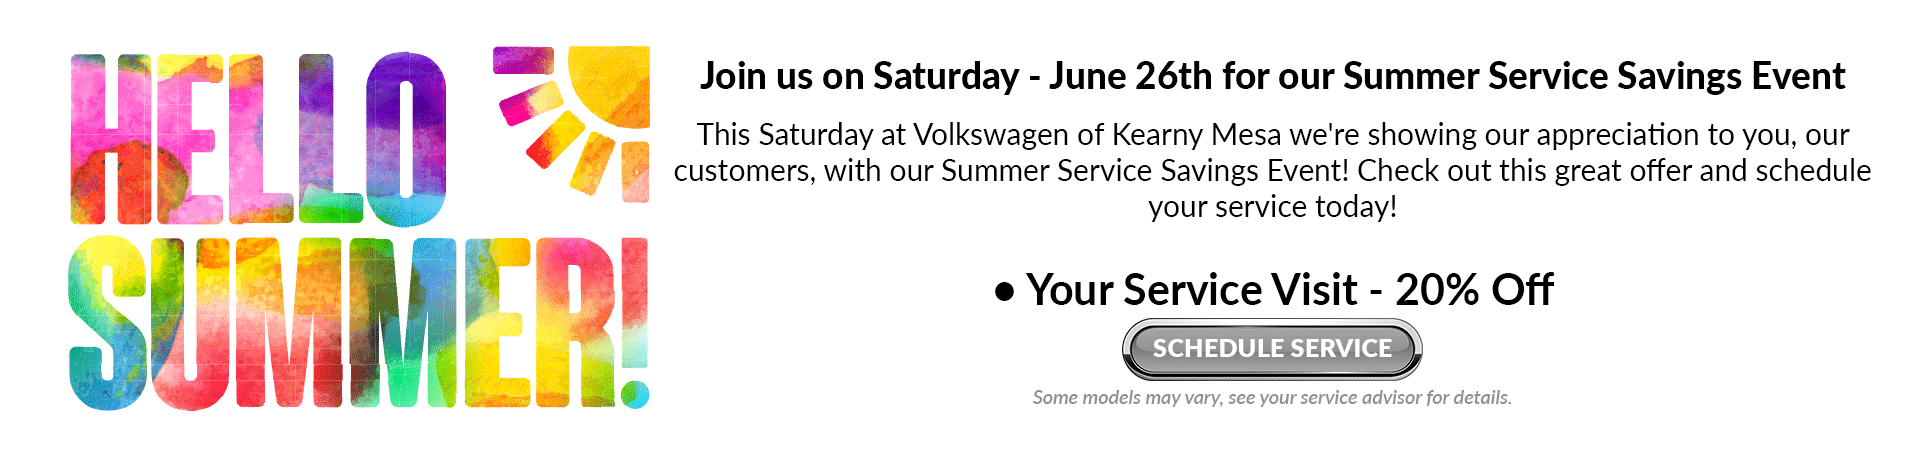 JUNE-web-Volkswagen-of-Kearny-Mesa